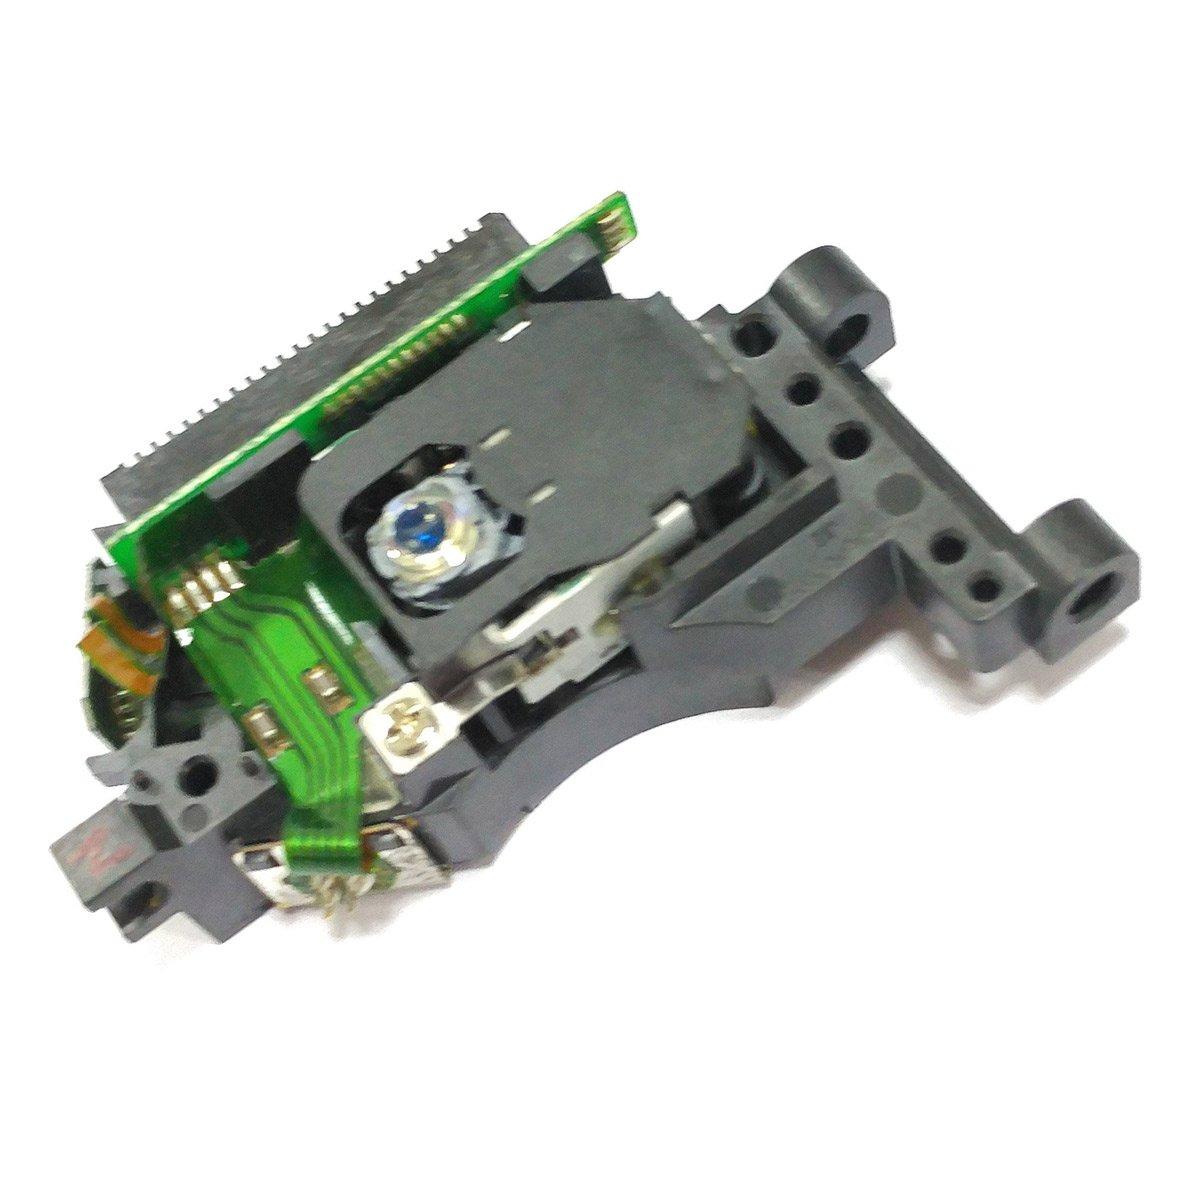 Original SACD Optical Pickup for TEAC Esoteric DV-60 SACD Laser Lens